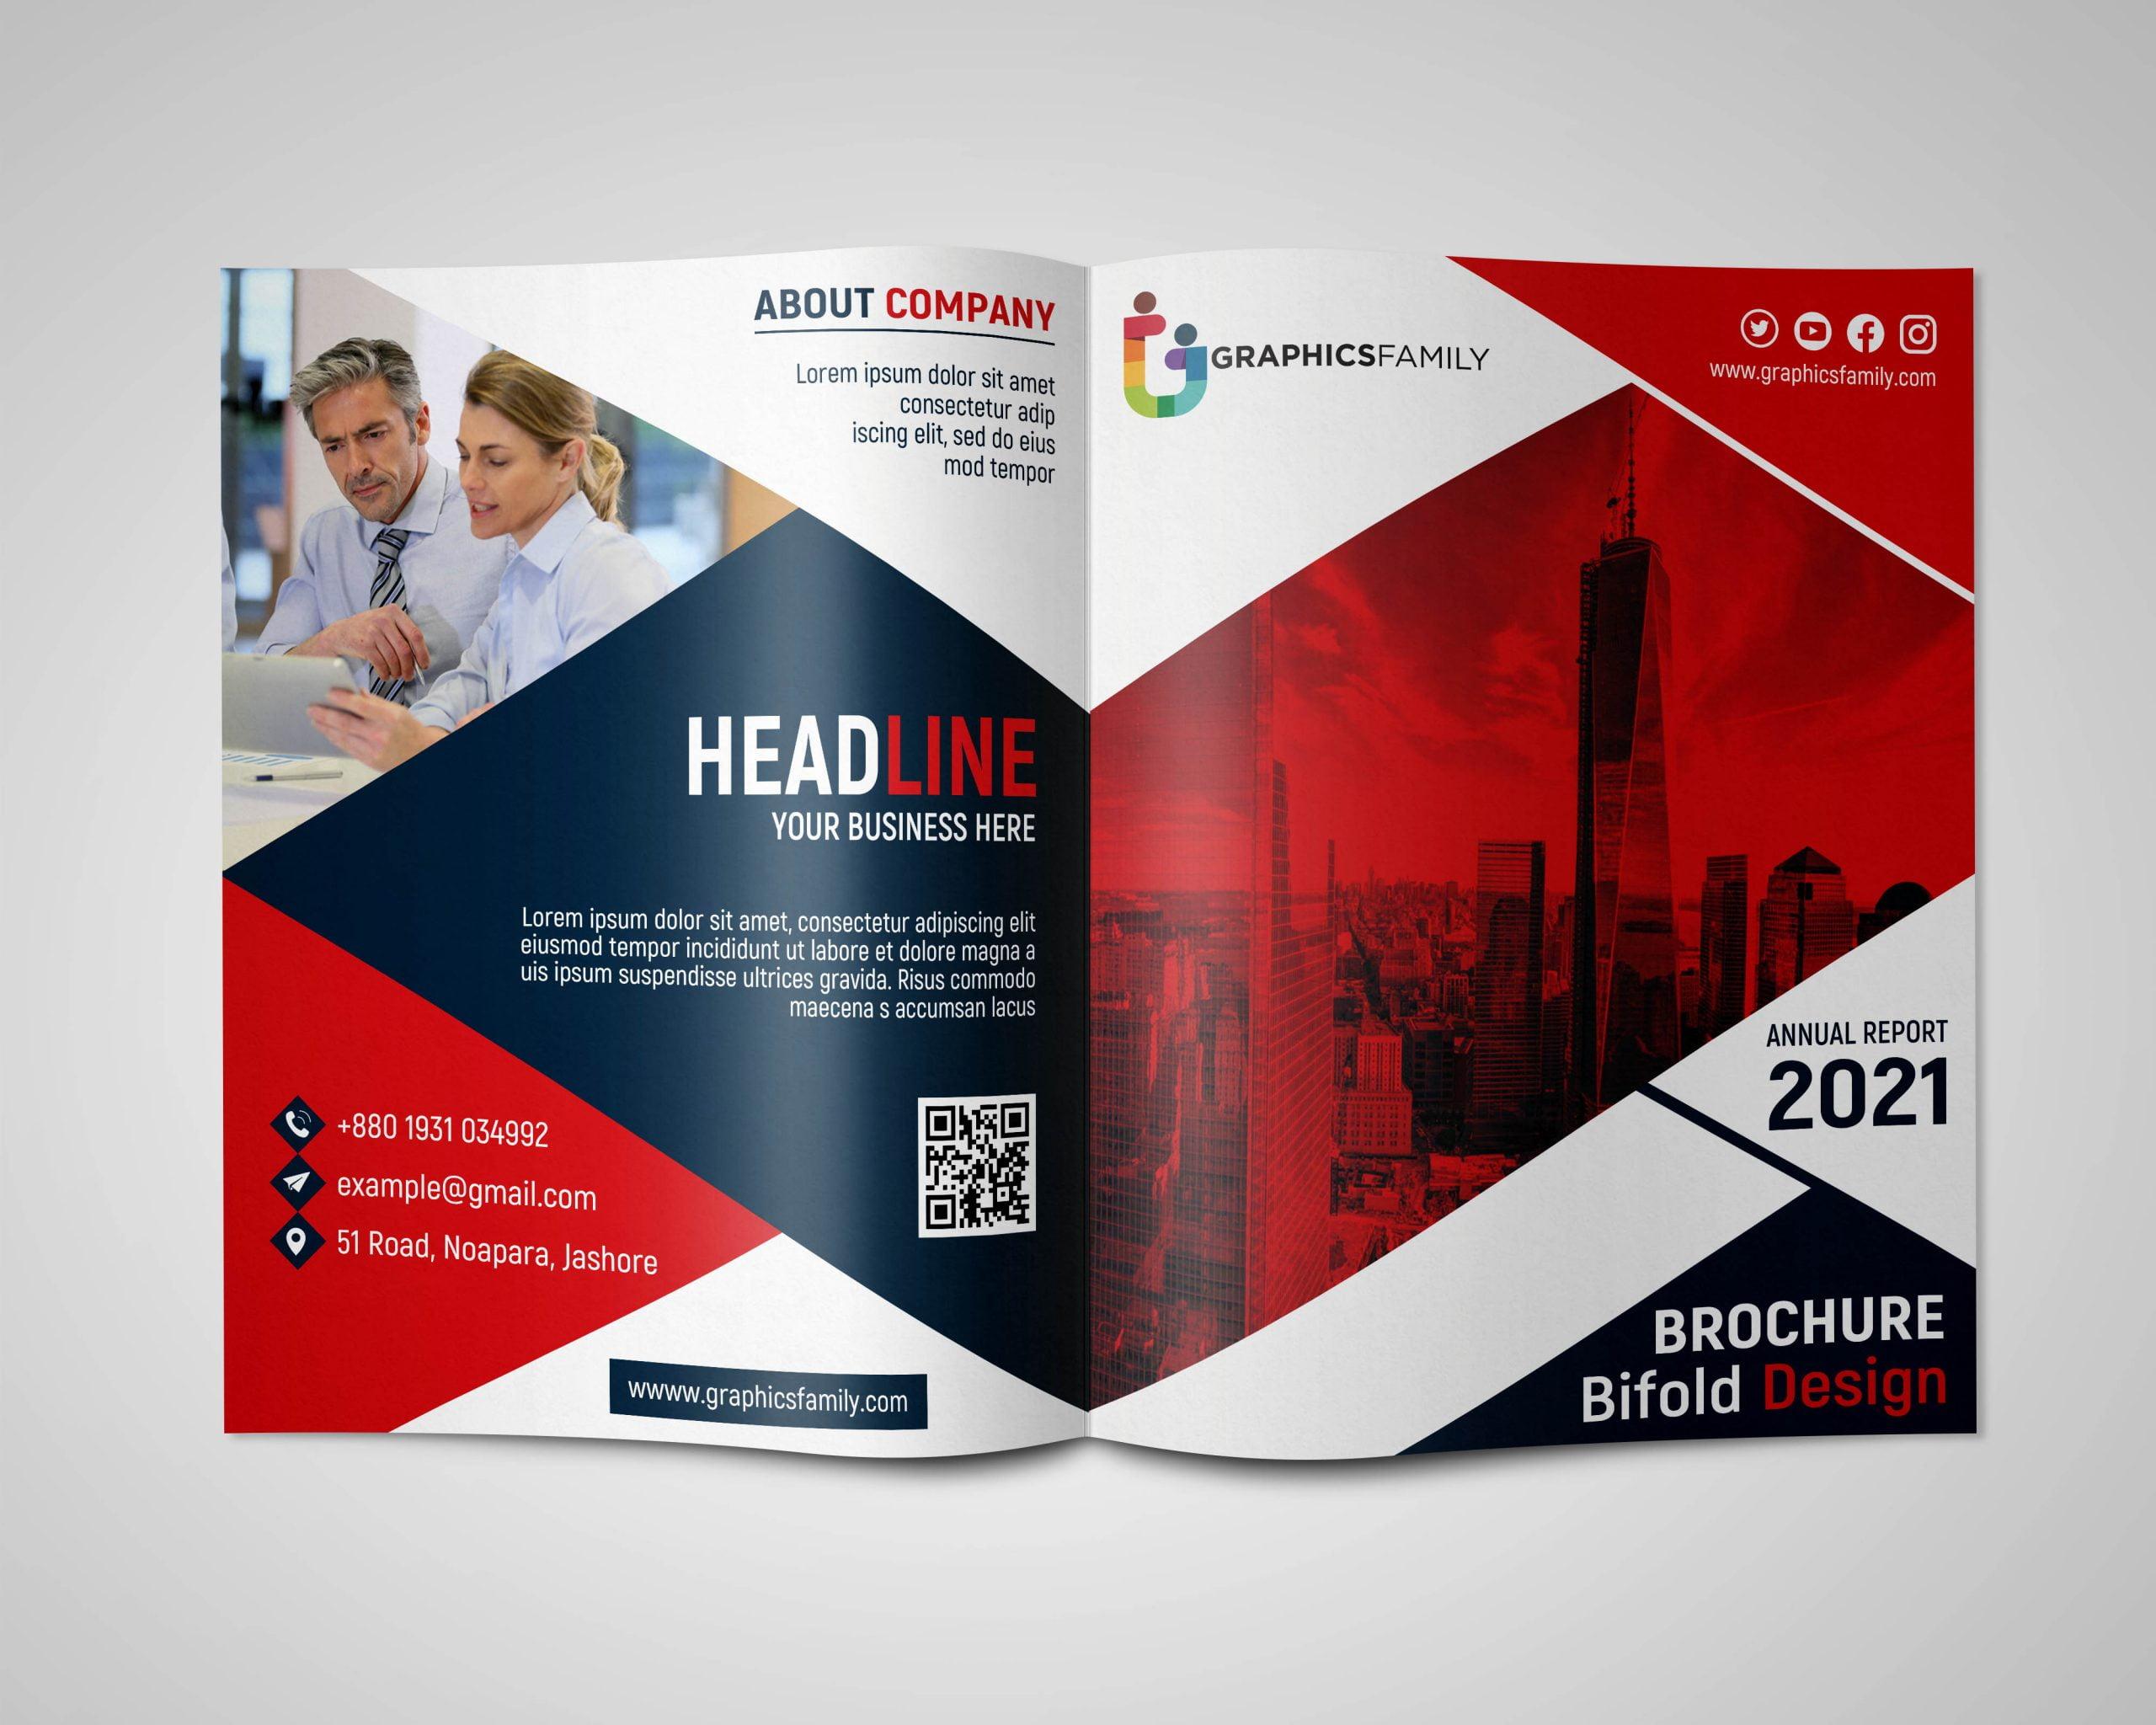 Bifold Brochure Design PSD Download